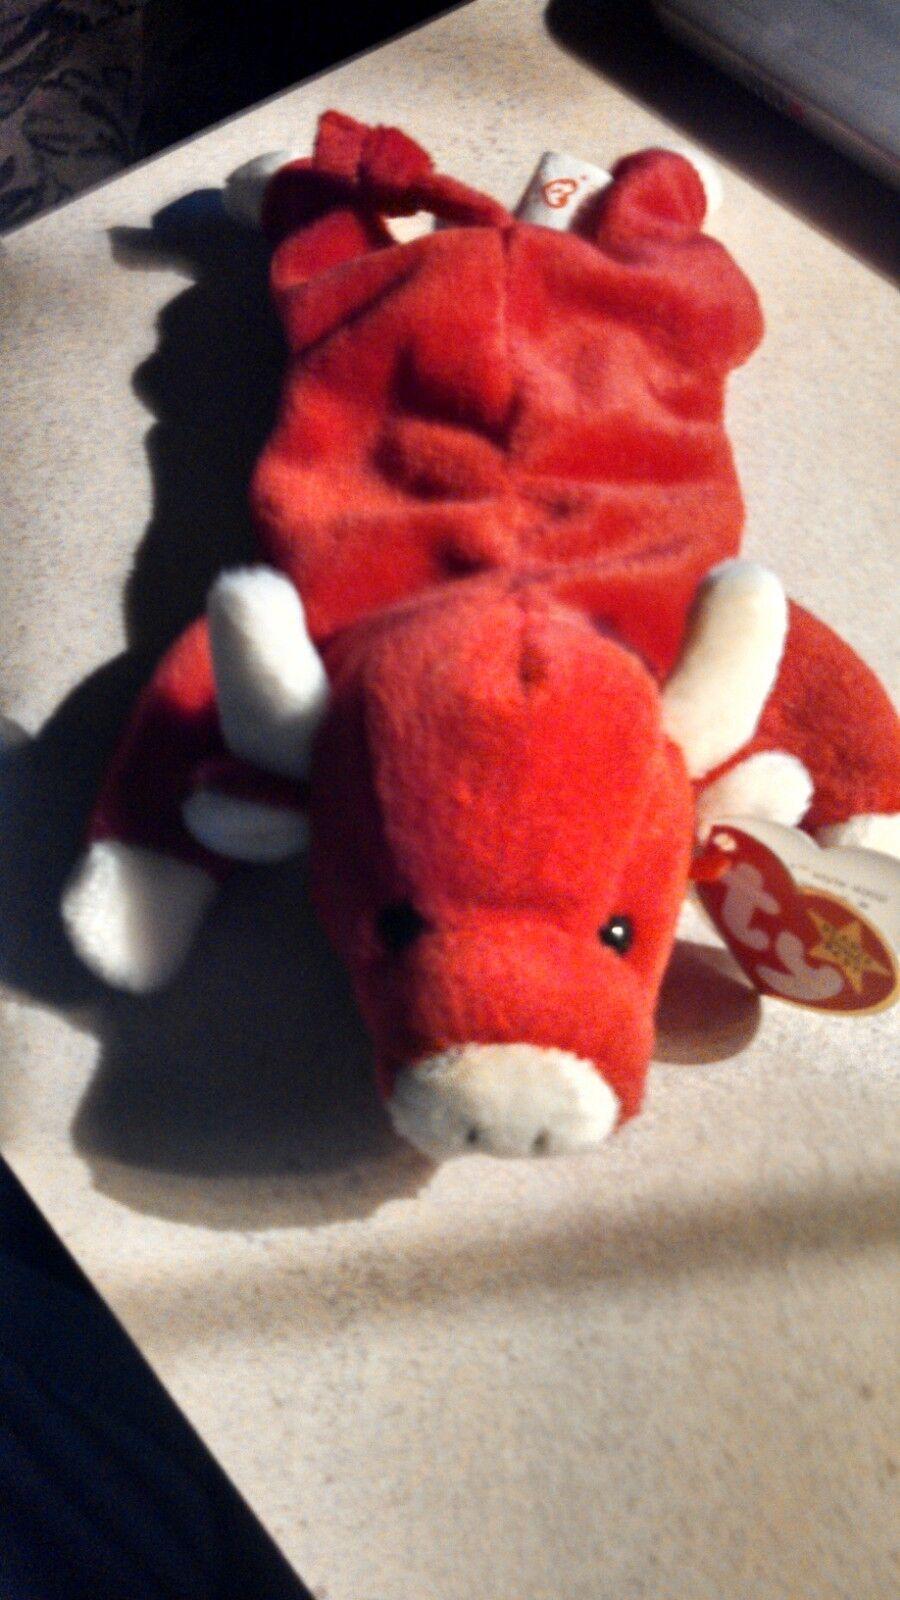 008421040025     jahrgang 1995 snort selten ty beanie baby rot bull plushie.